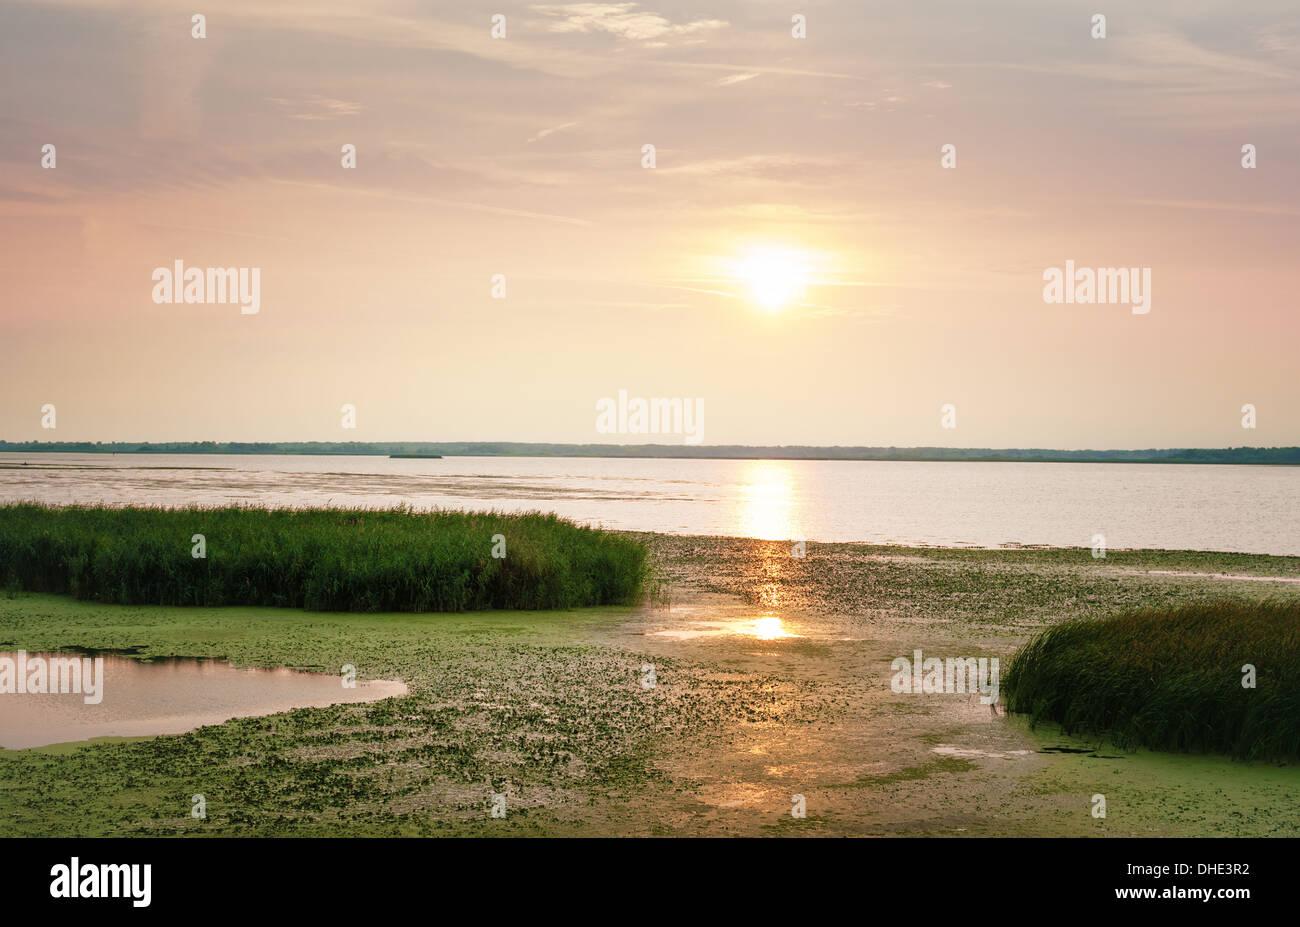 Sonnenaufgang am Theiß-See, Ungarn. Stockbild